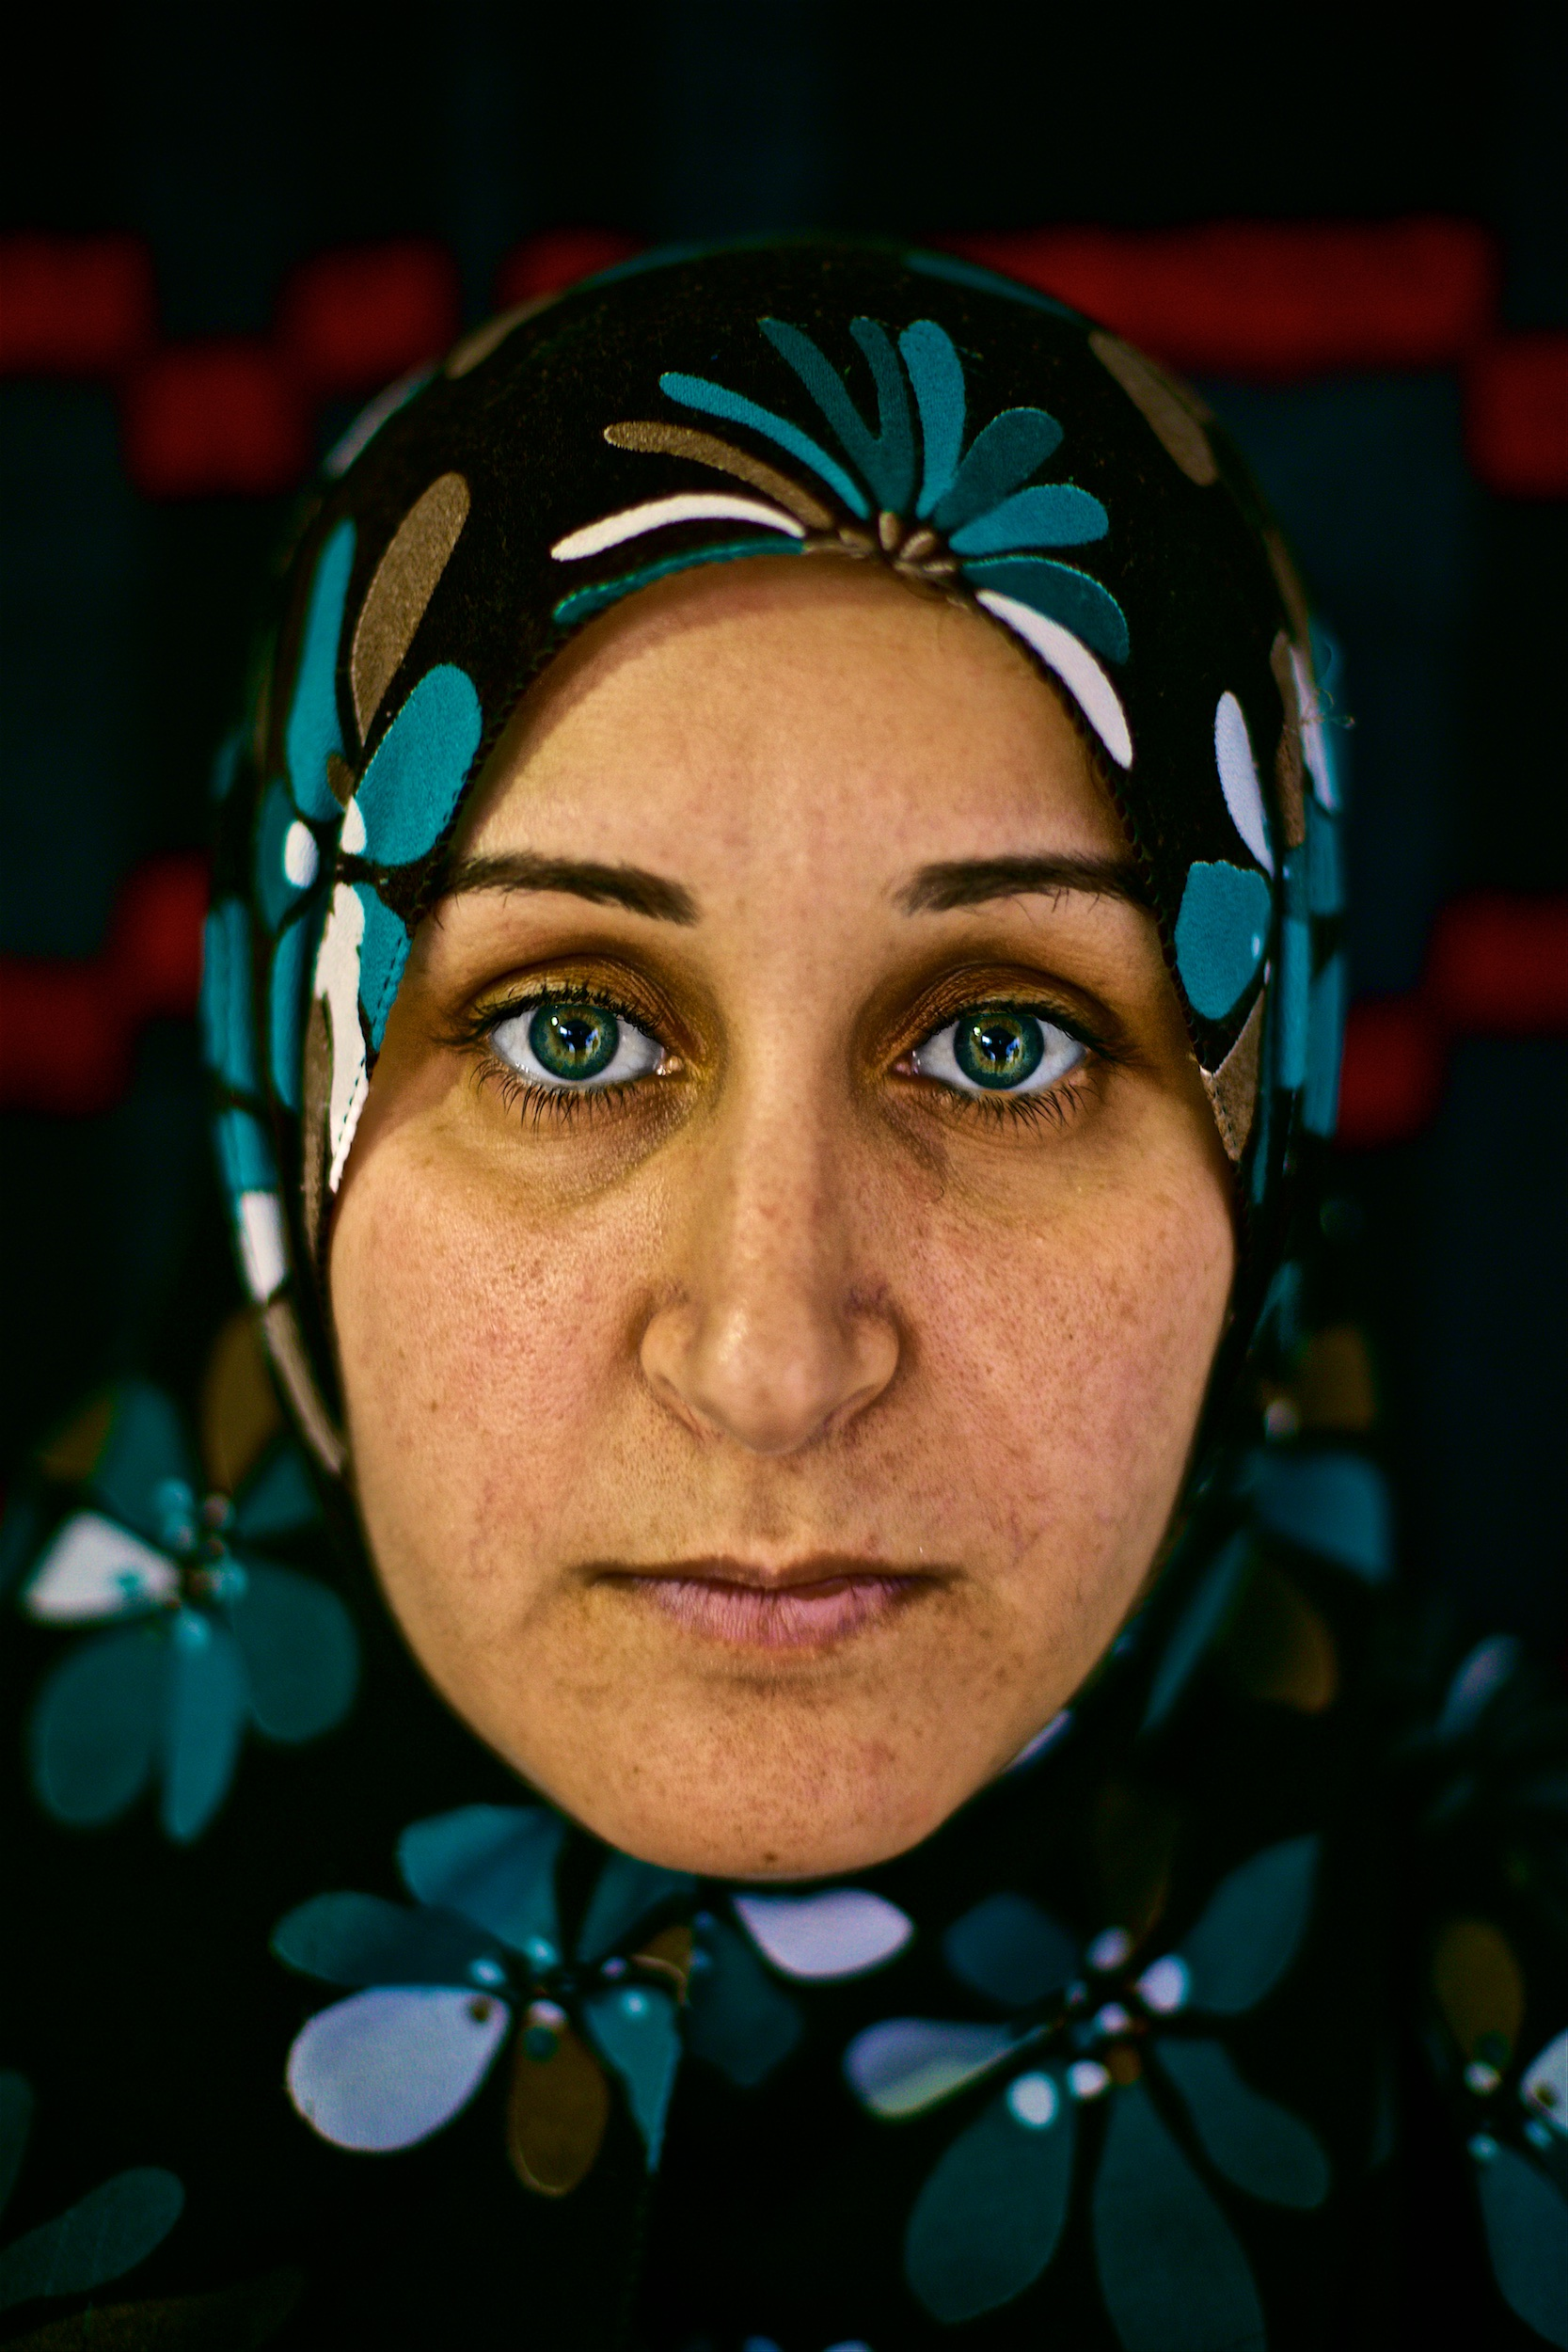 jordan-msf-al-ramtha-dectors-without-borders-war-hospital-refugee-camp-denis-bosnic-38.jpg